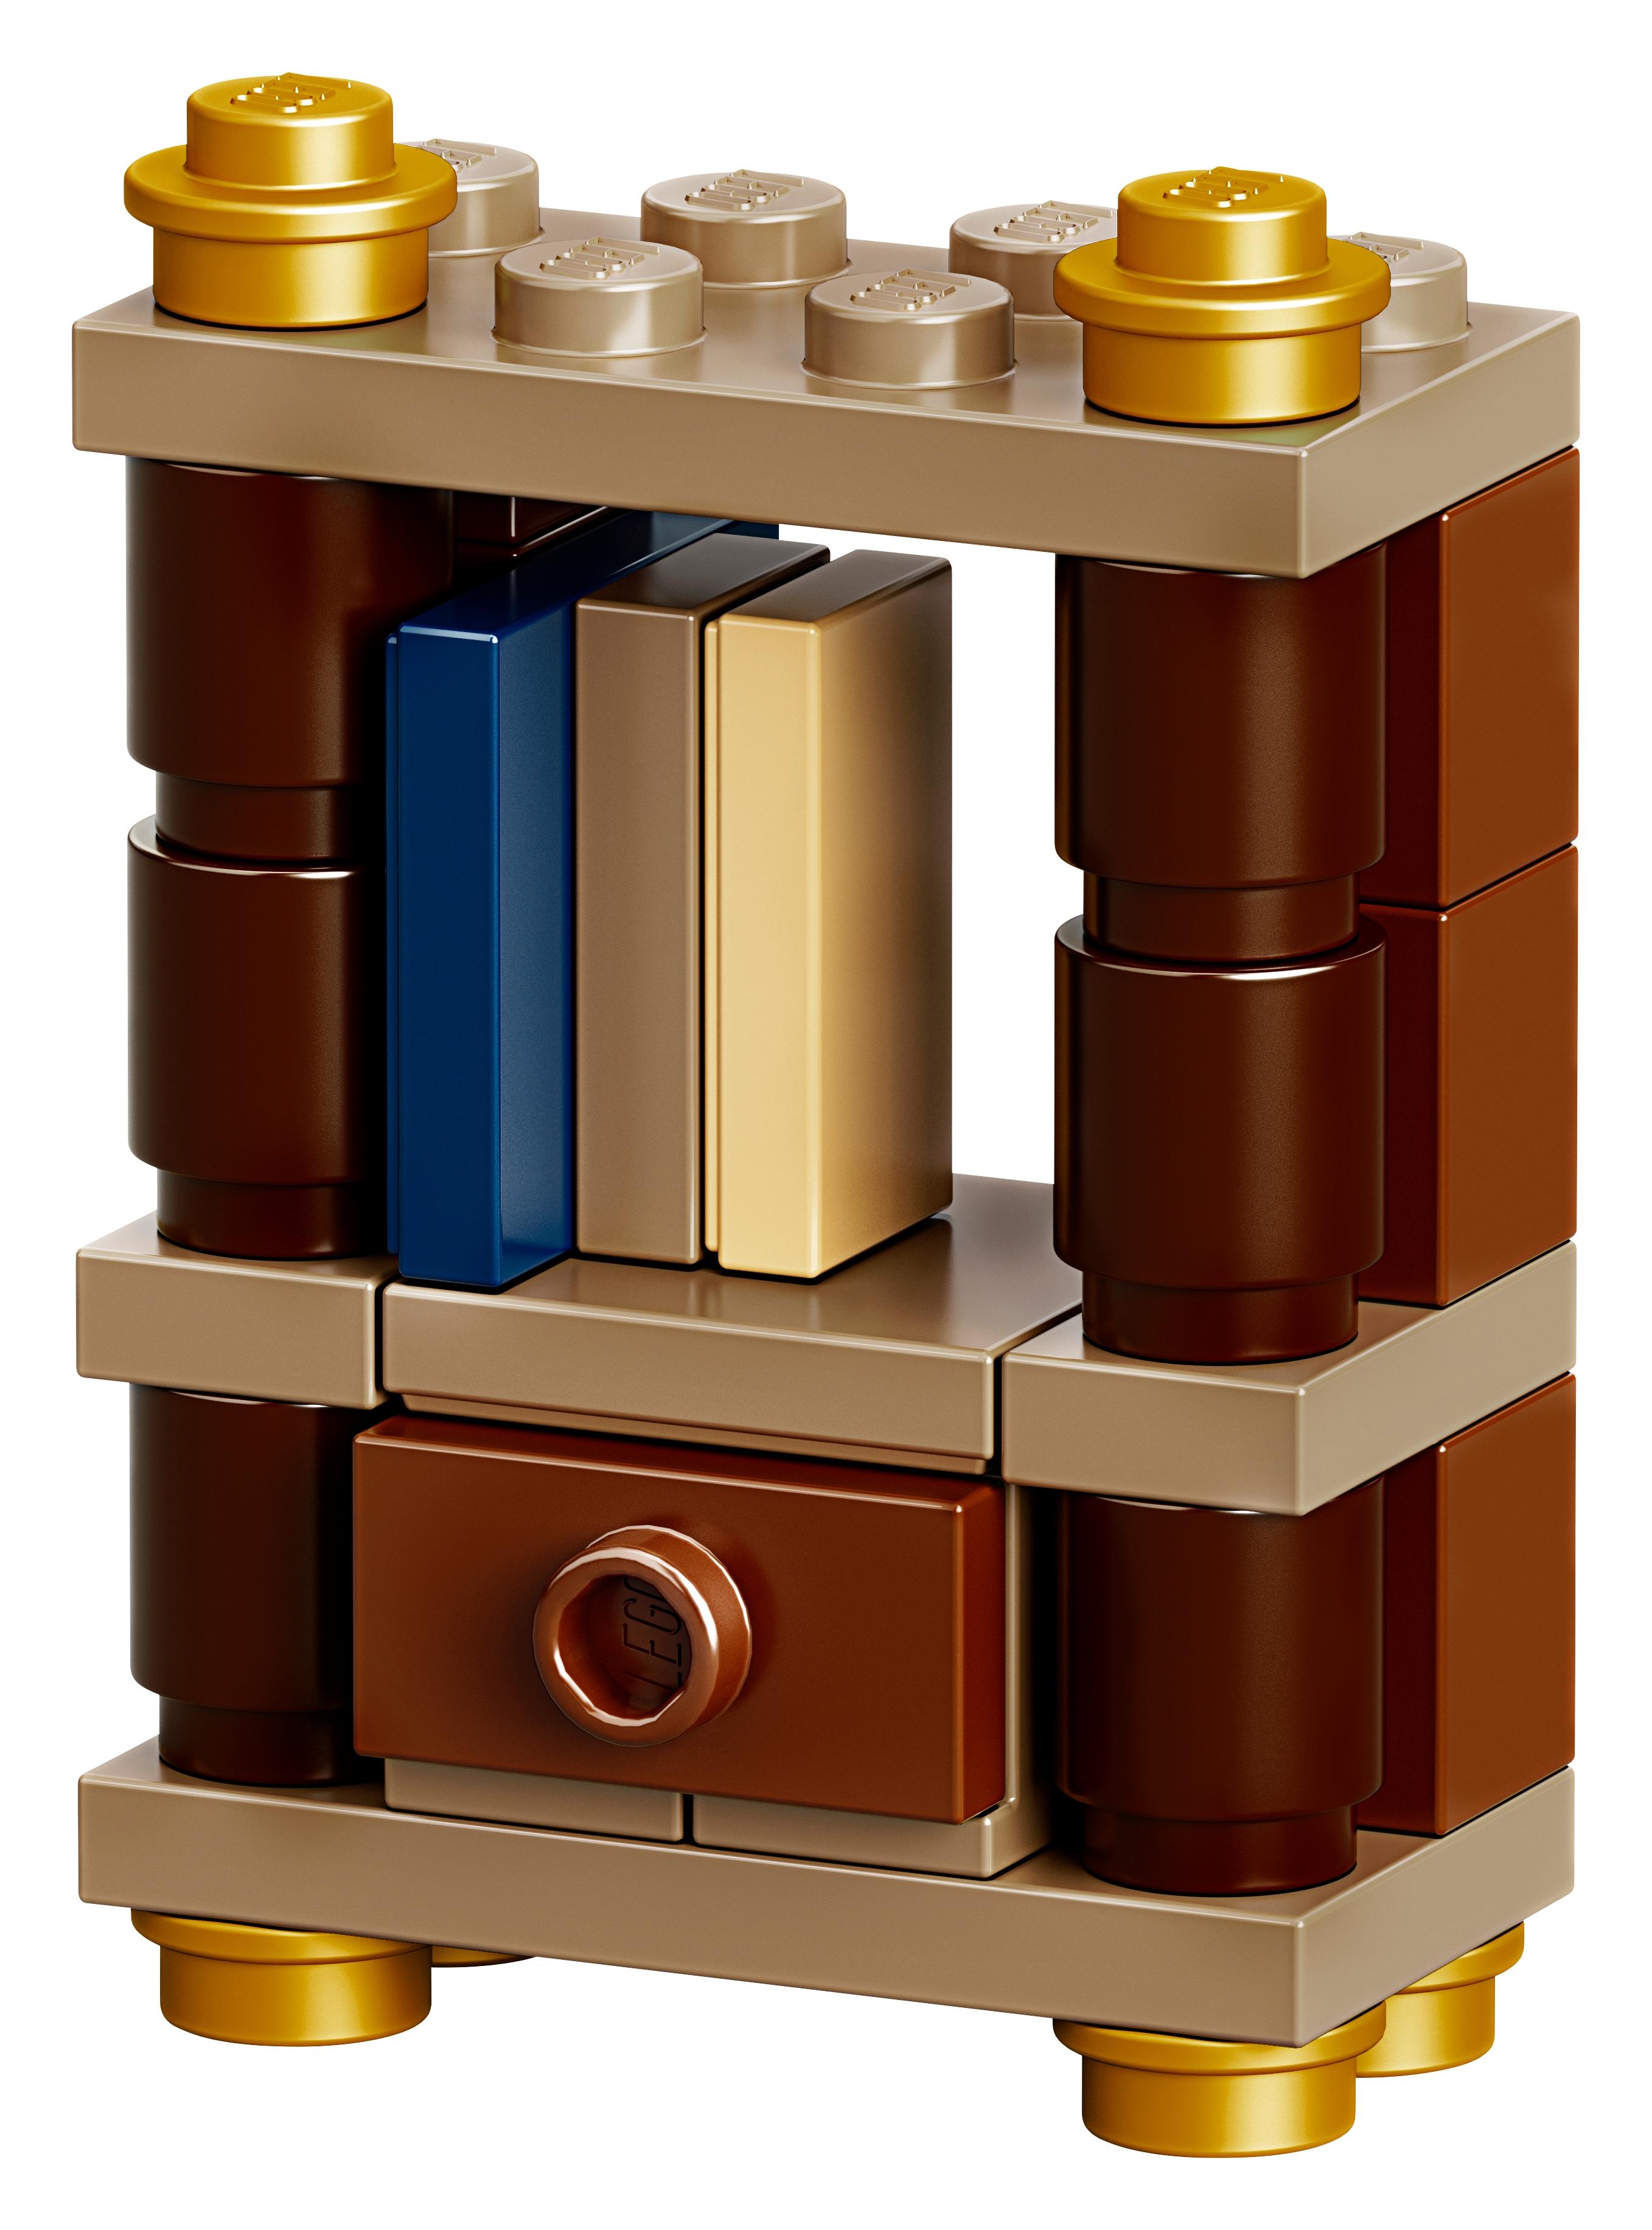 LEGO Harry Potter 40419 Hogwarts elevtillbehörsset